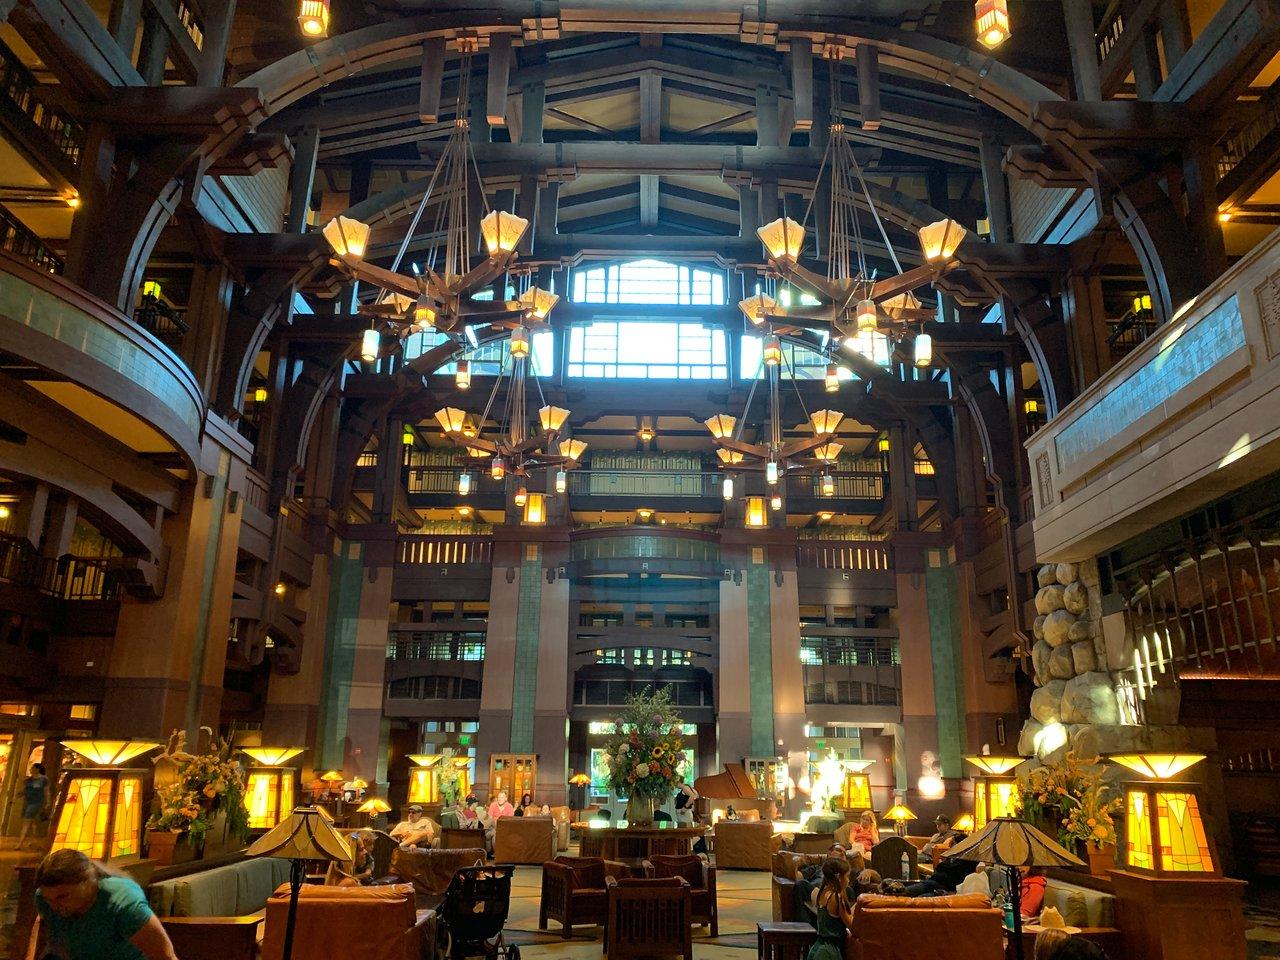 Disney's Grand Californian Resort Lobby Area